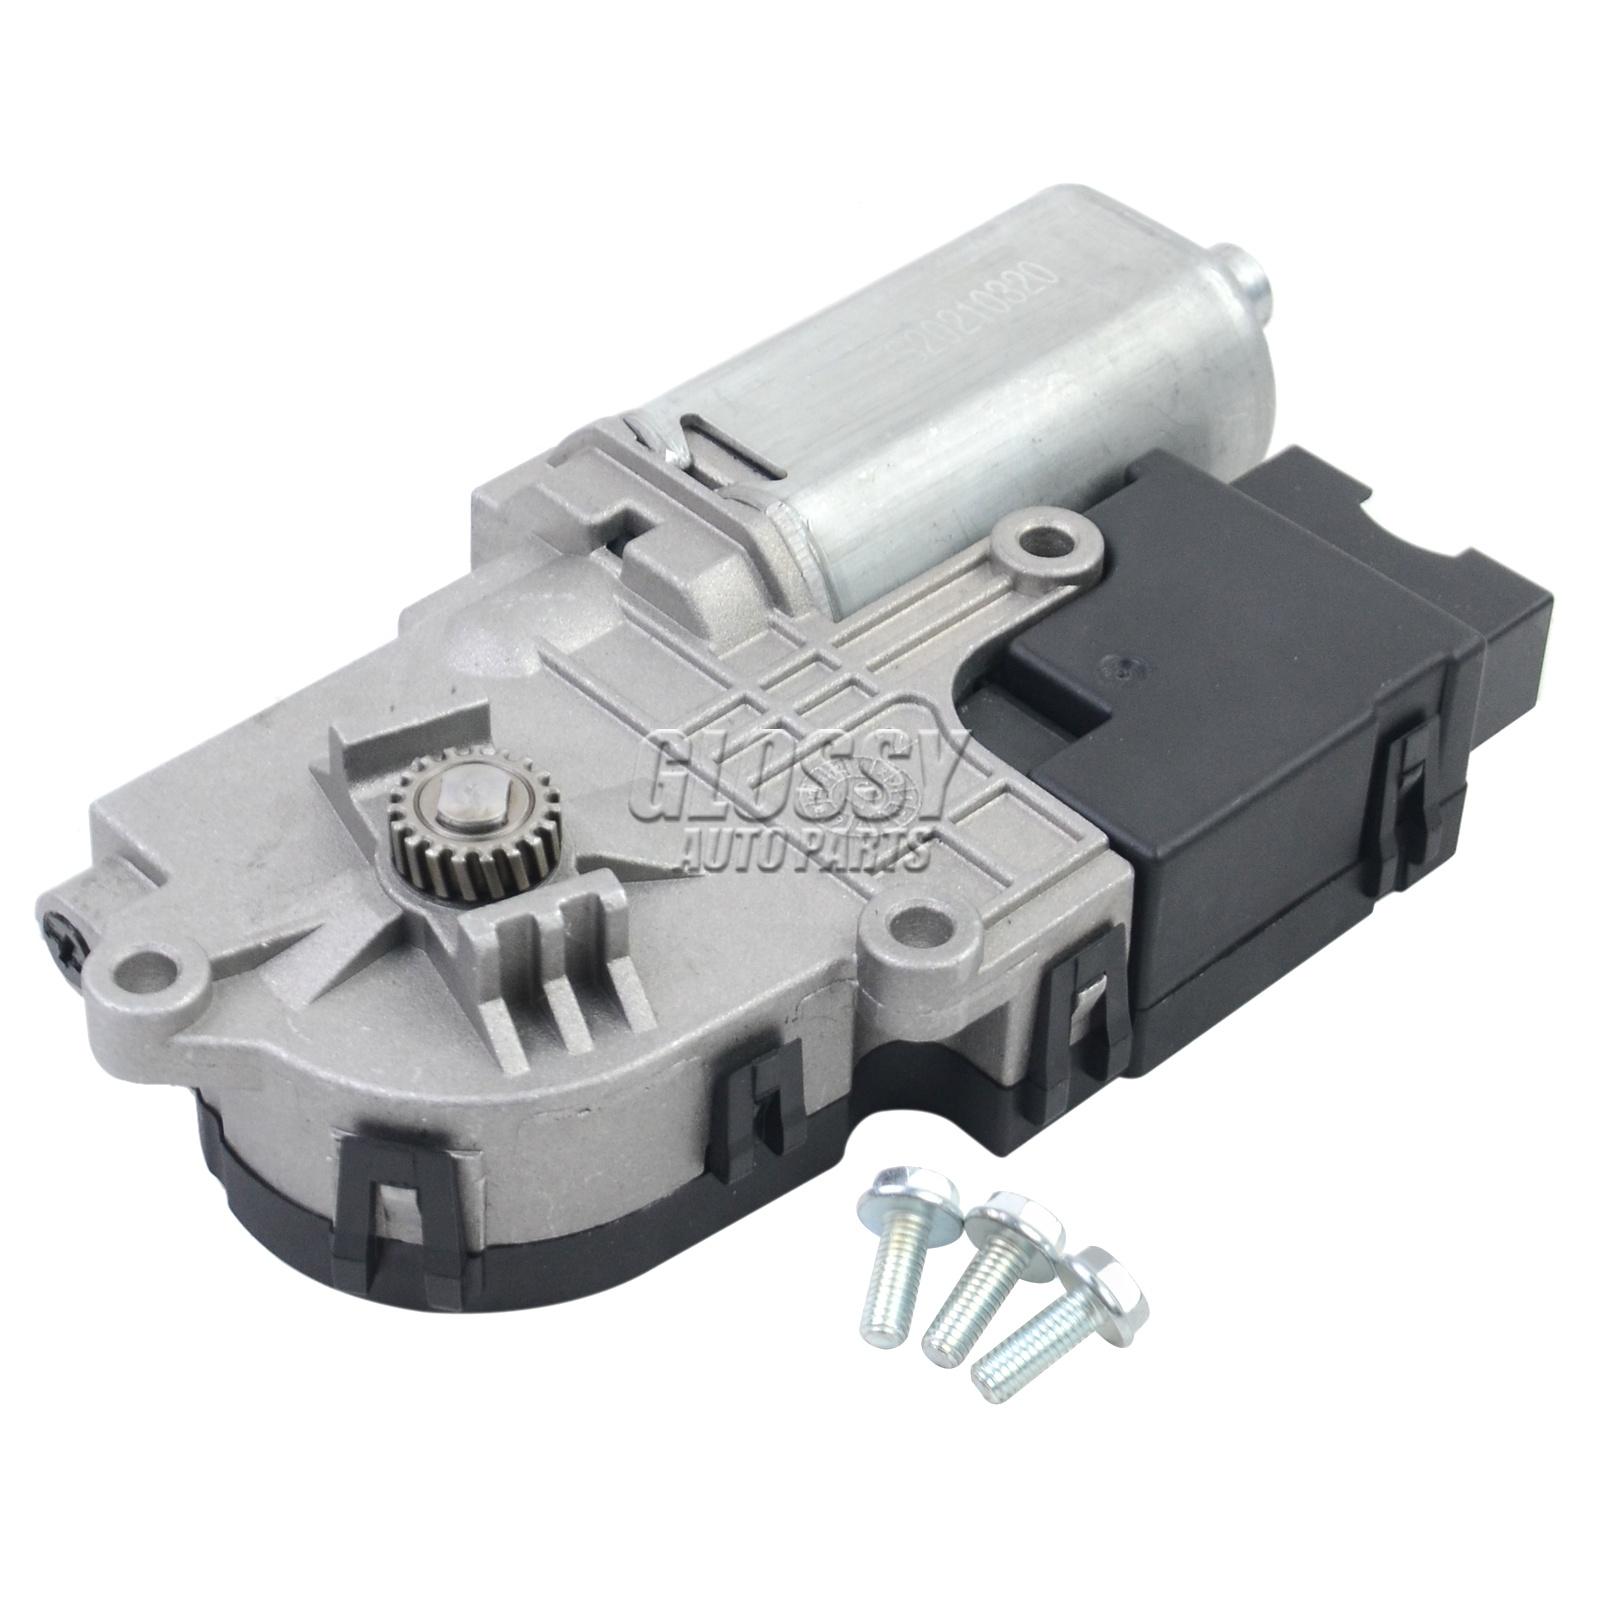 Glossy Sunroof Motor BB5Z15790A